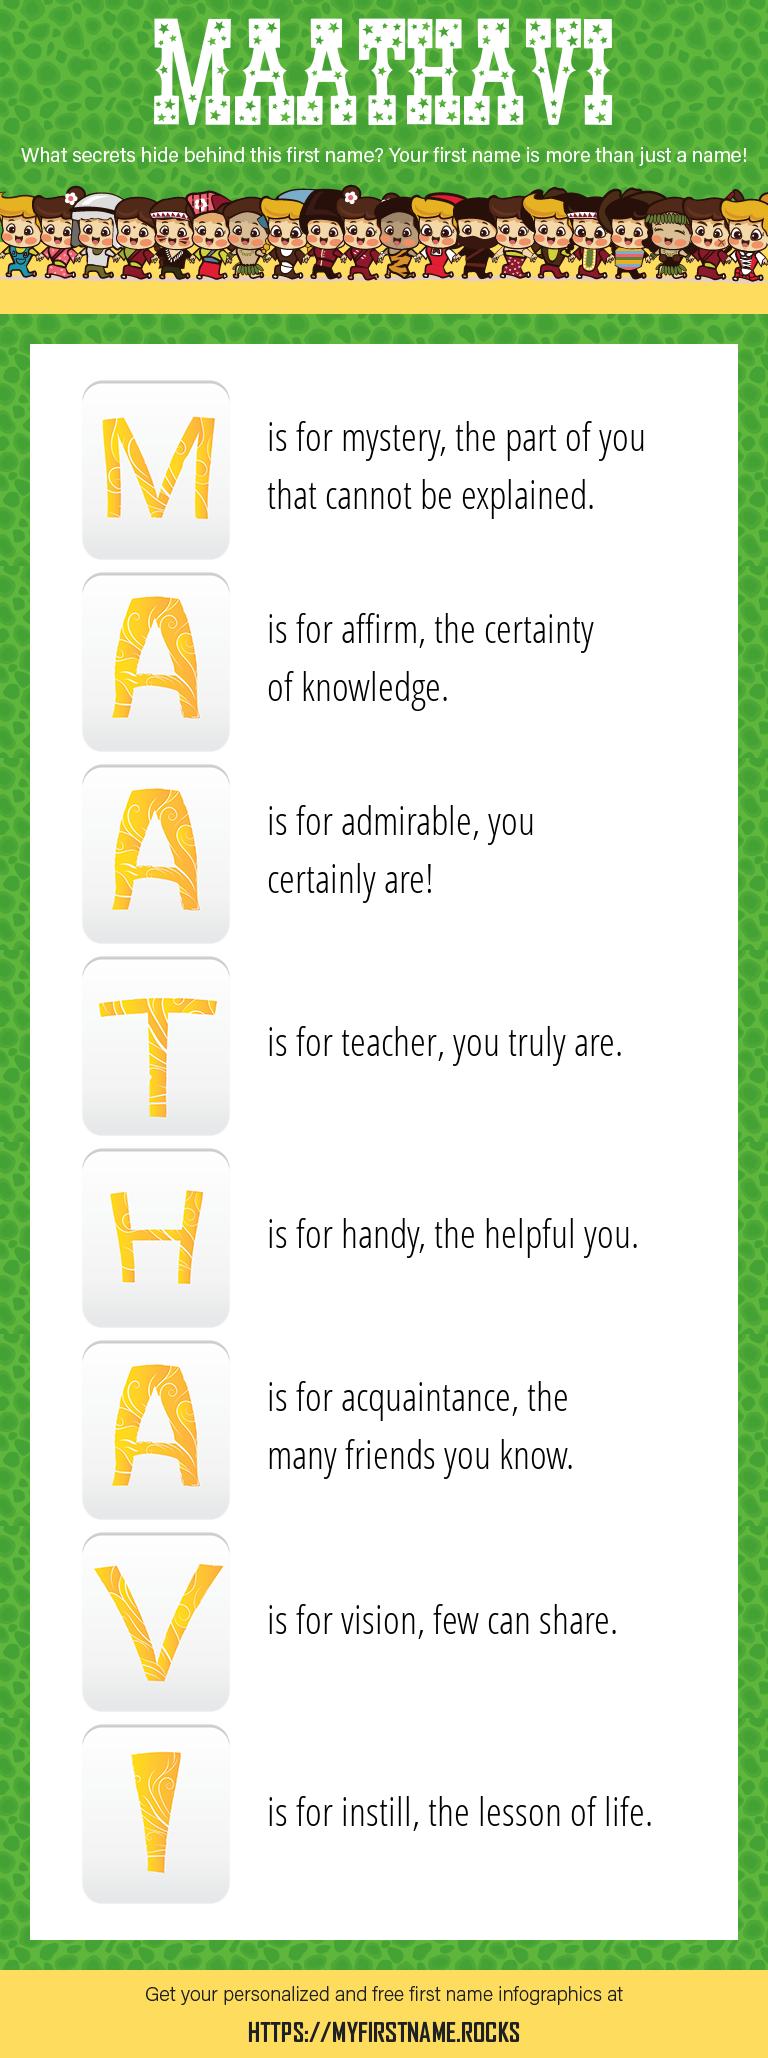 Maathavi Infographics